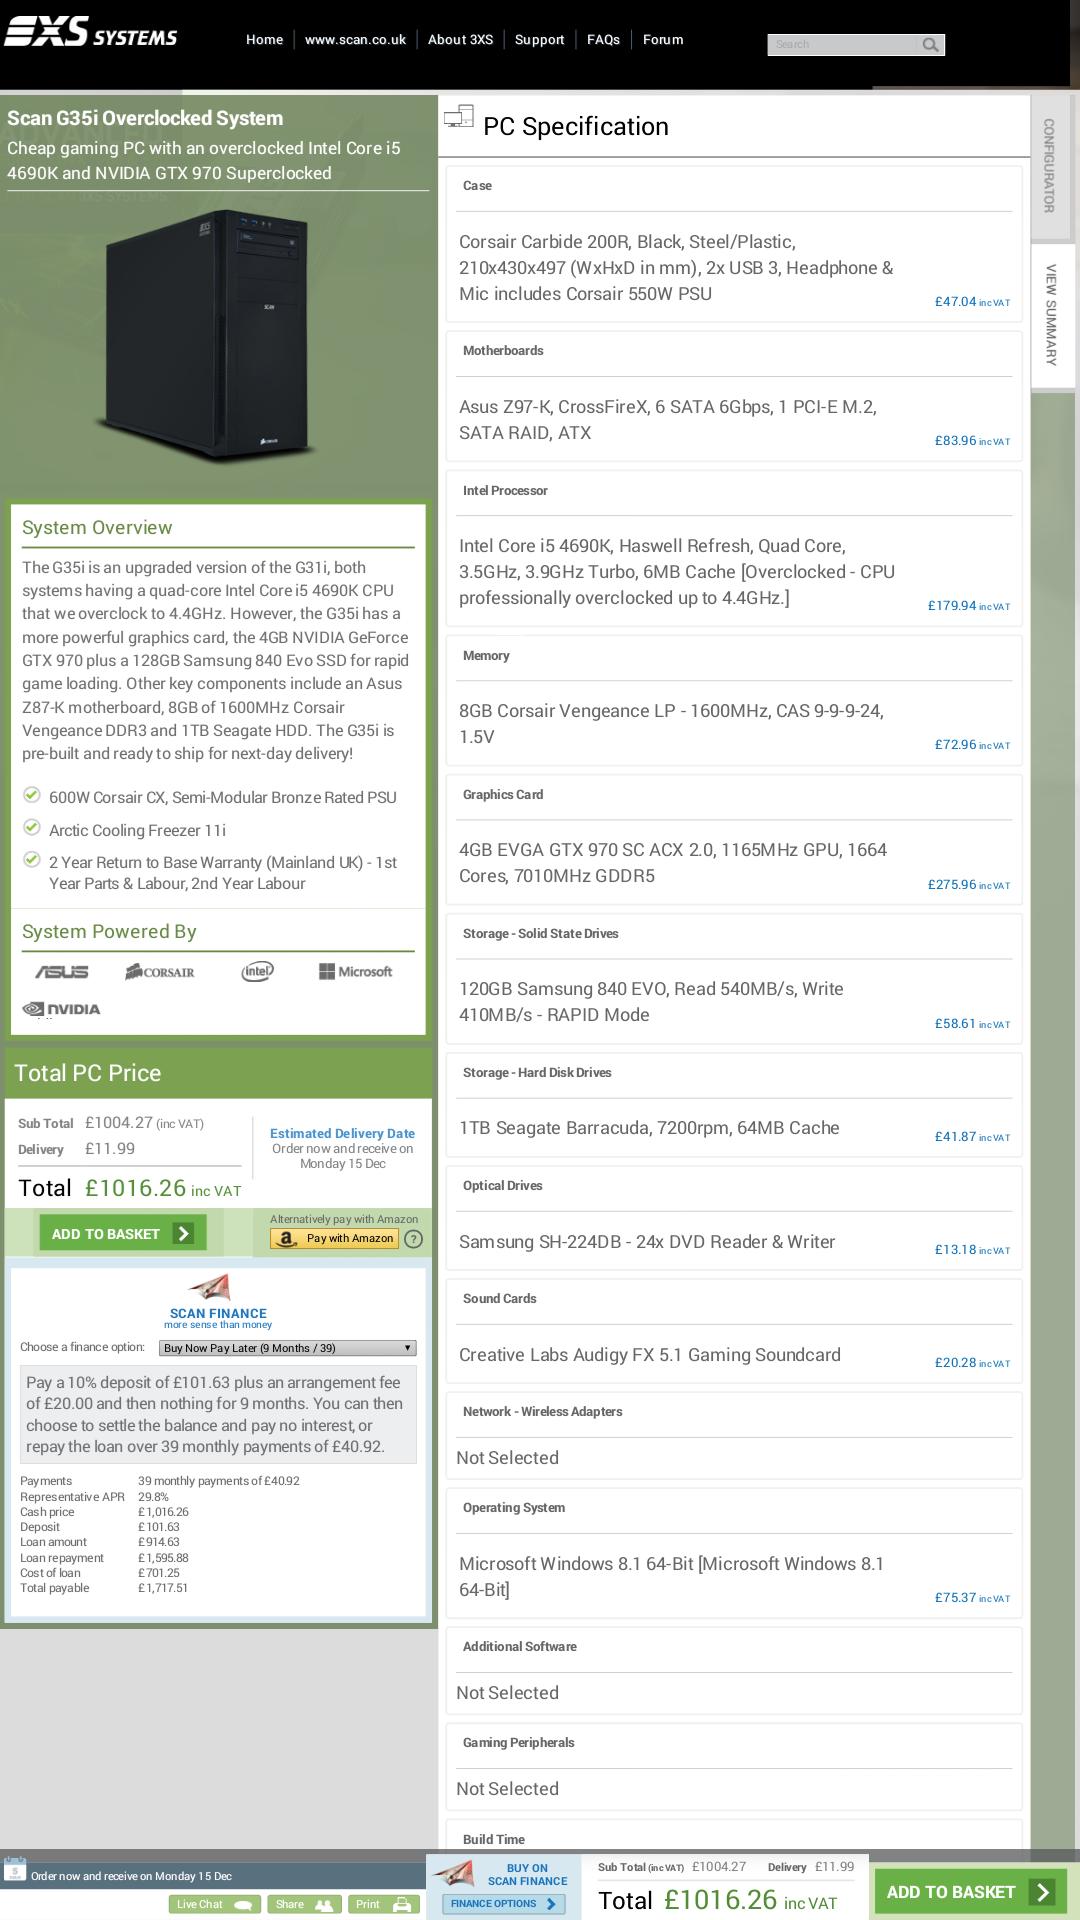 Screenshot_2014-12-14-19-54-03.png